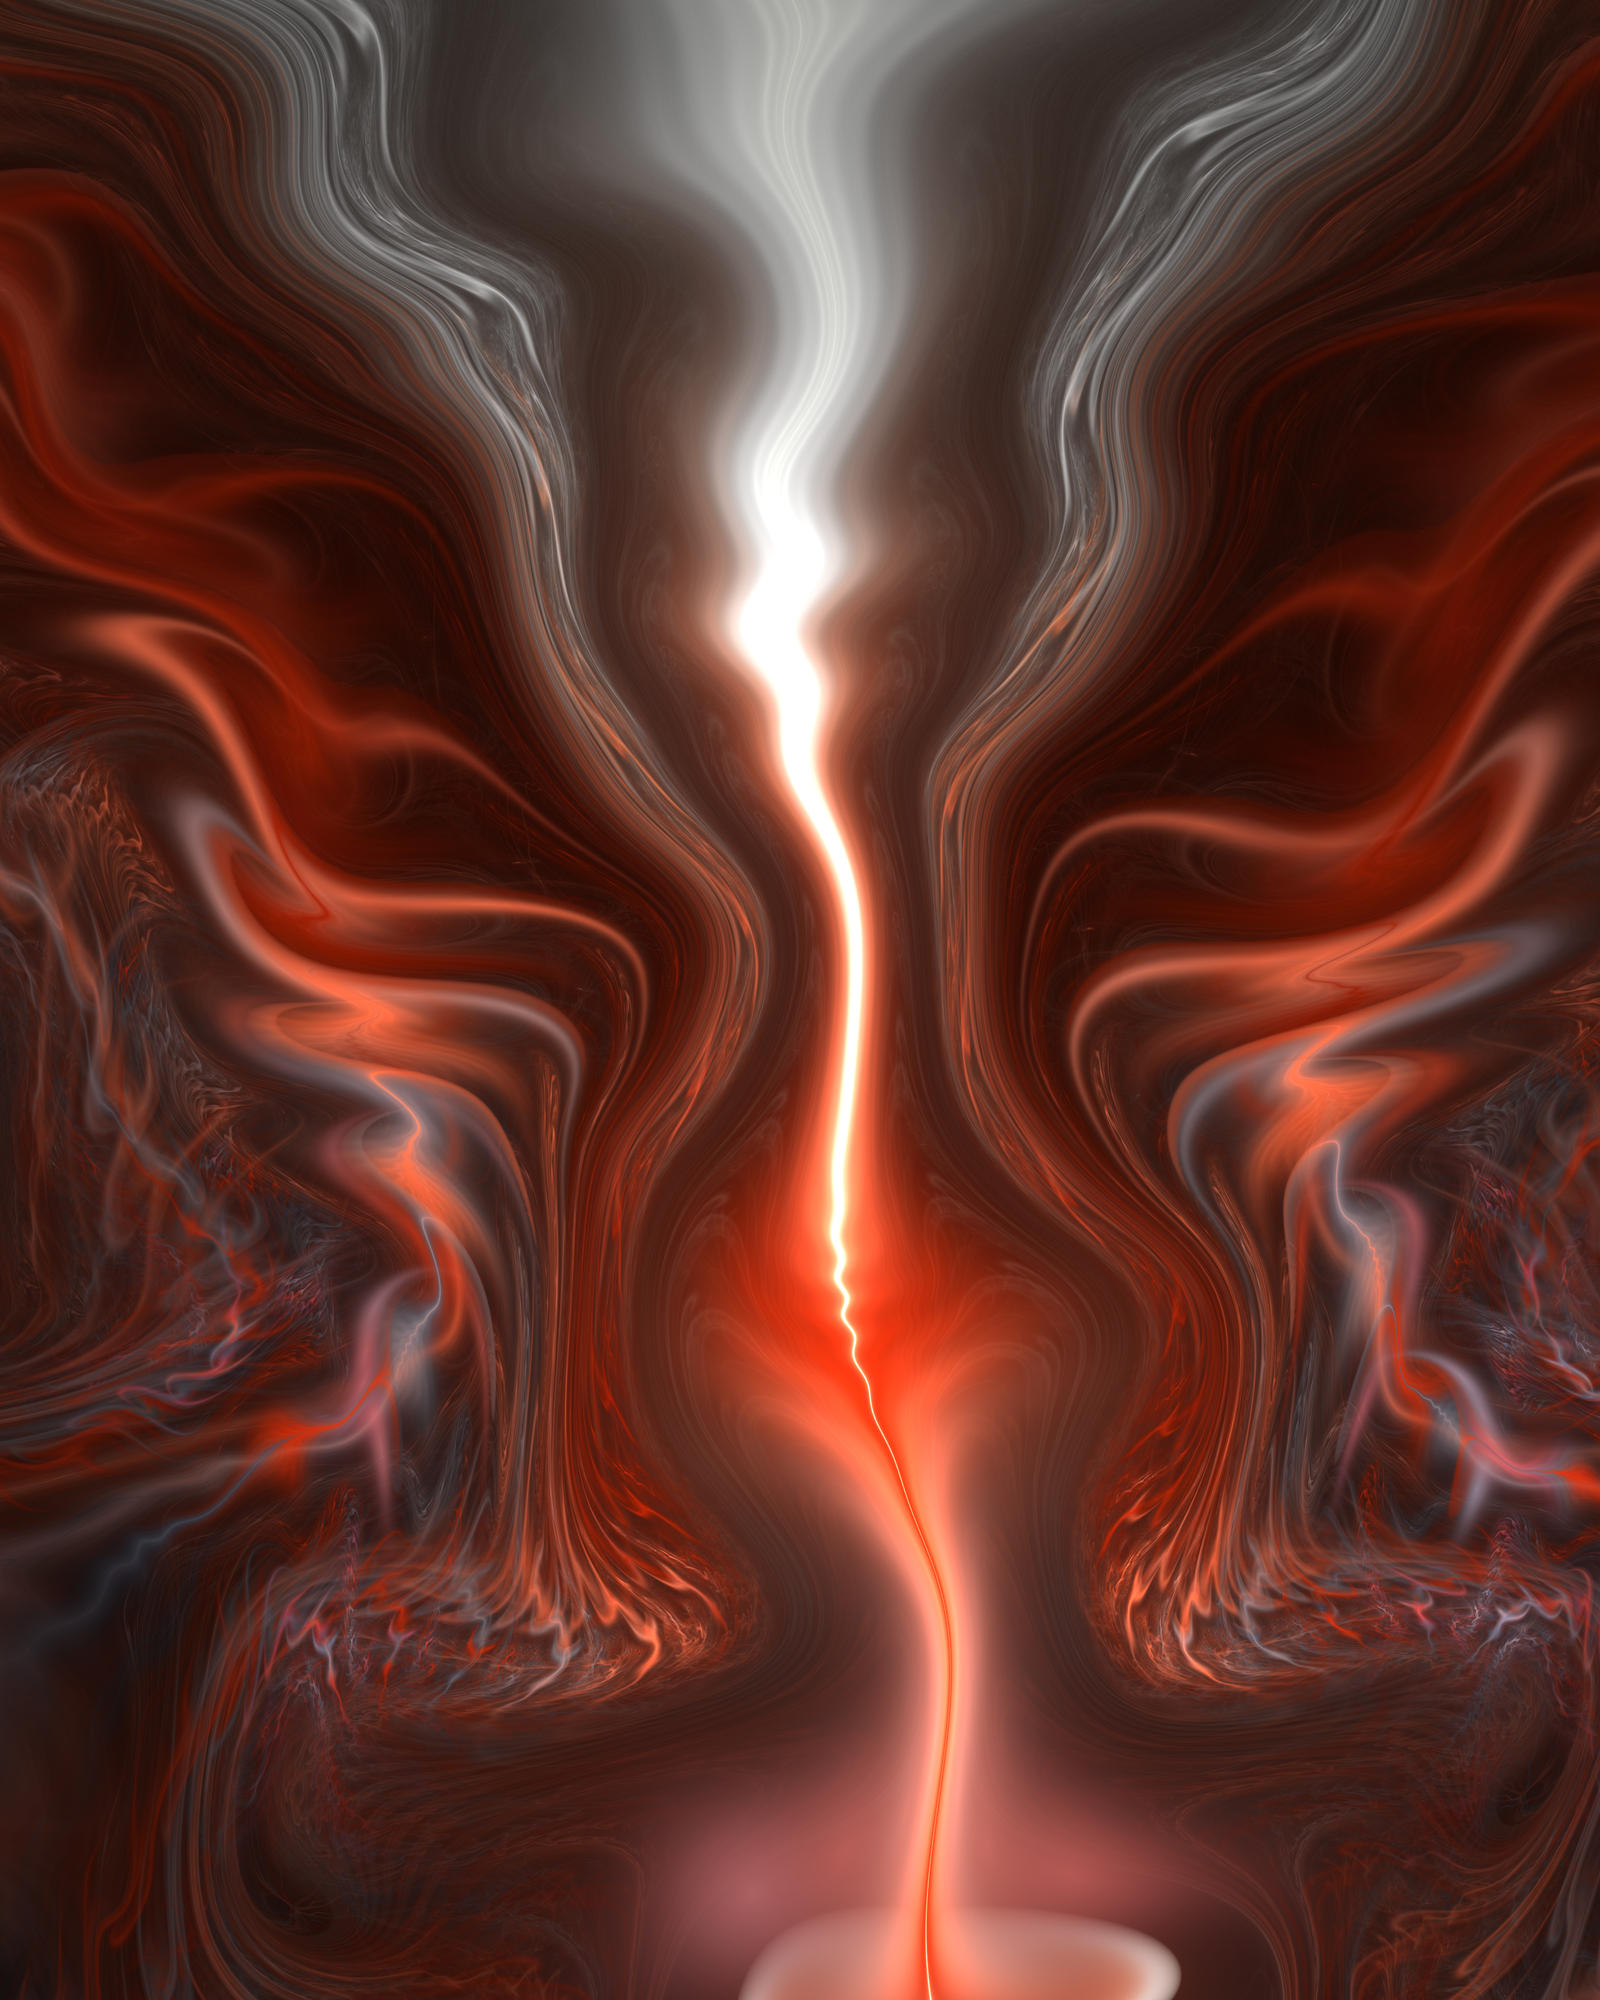 Smoke Signals by SuicideBySafetyPin